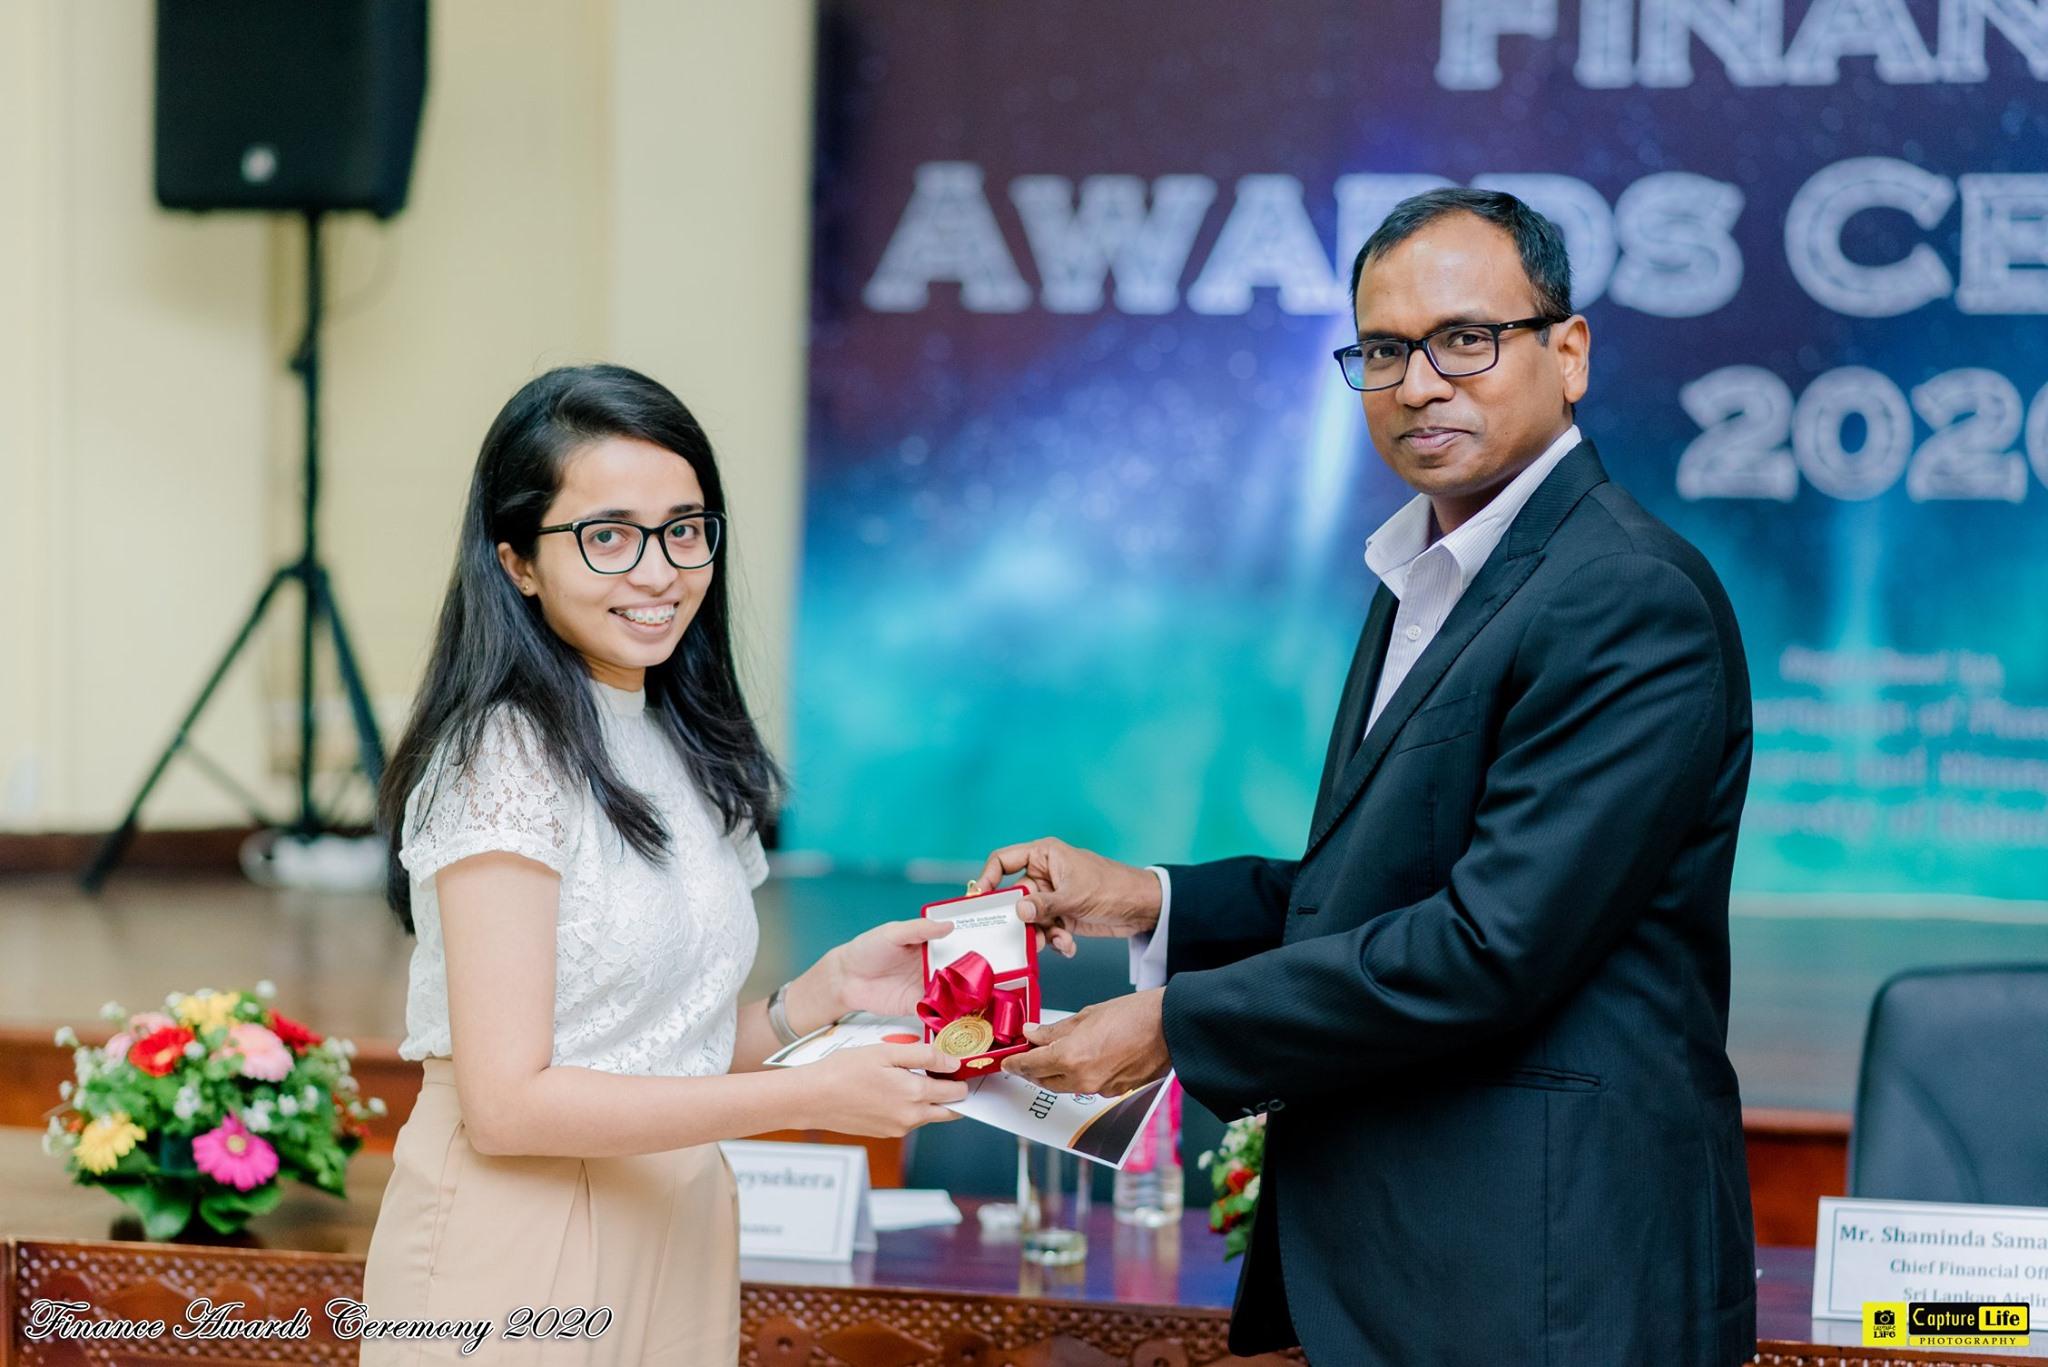 Finance Awards Ceremony 2020